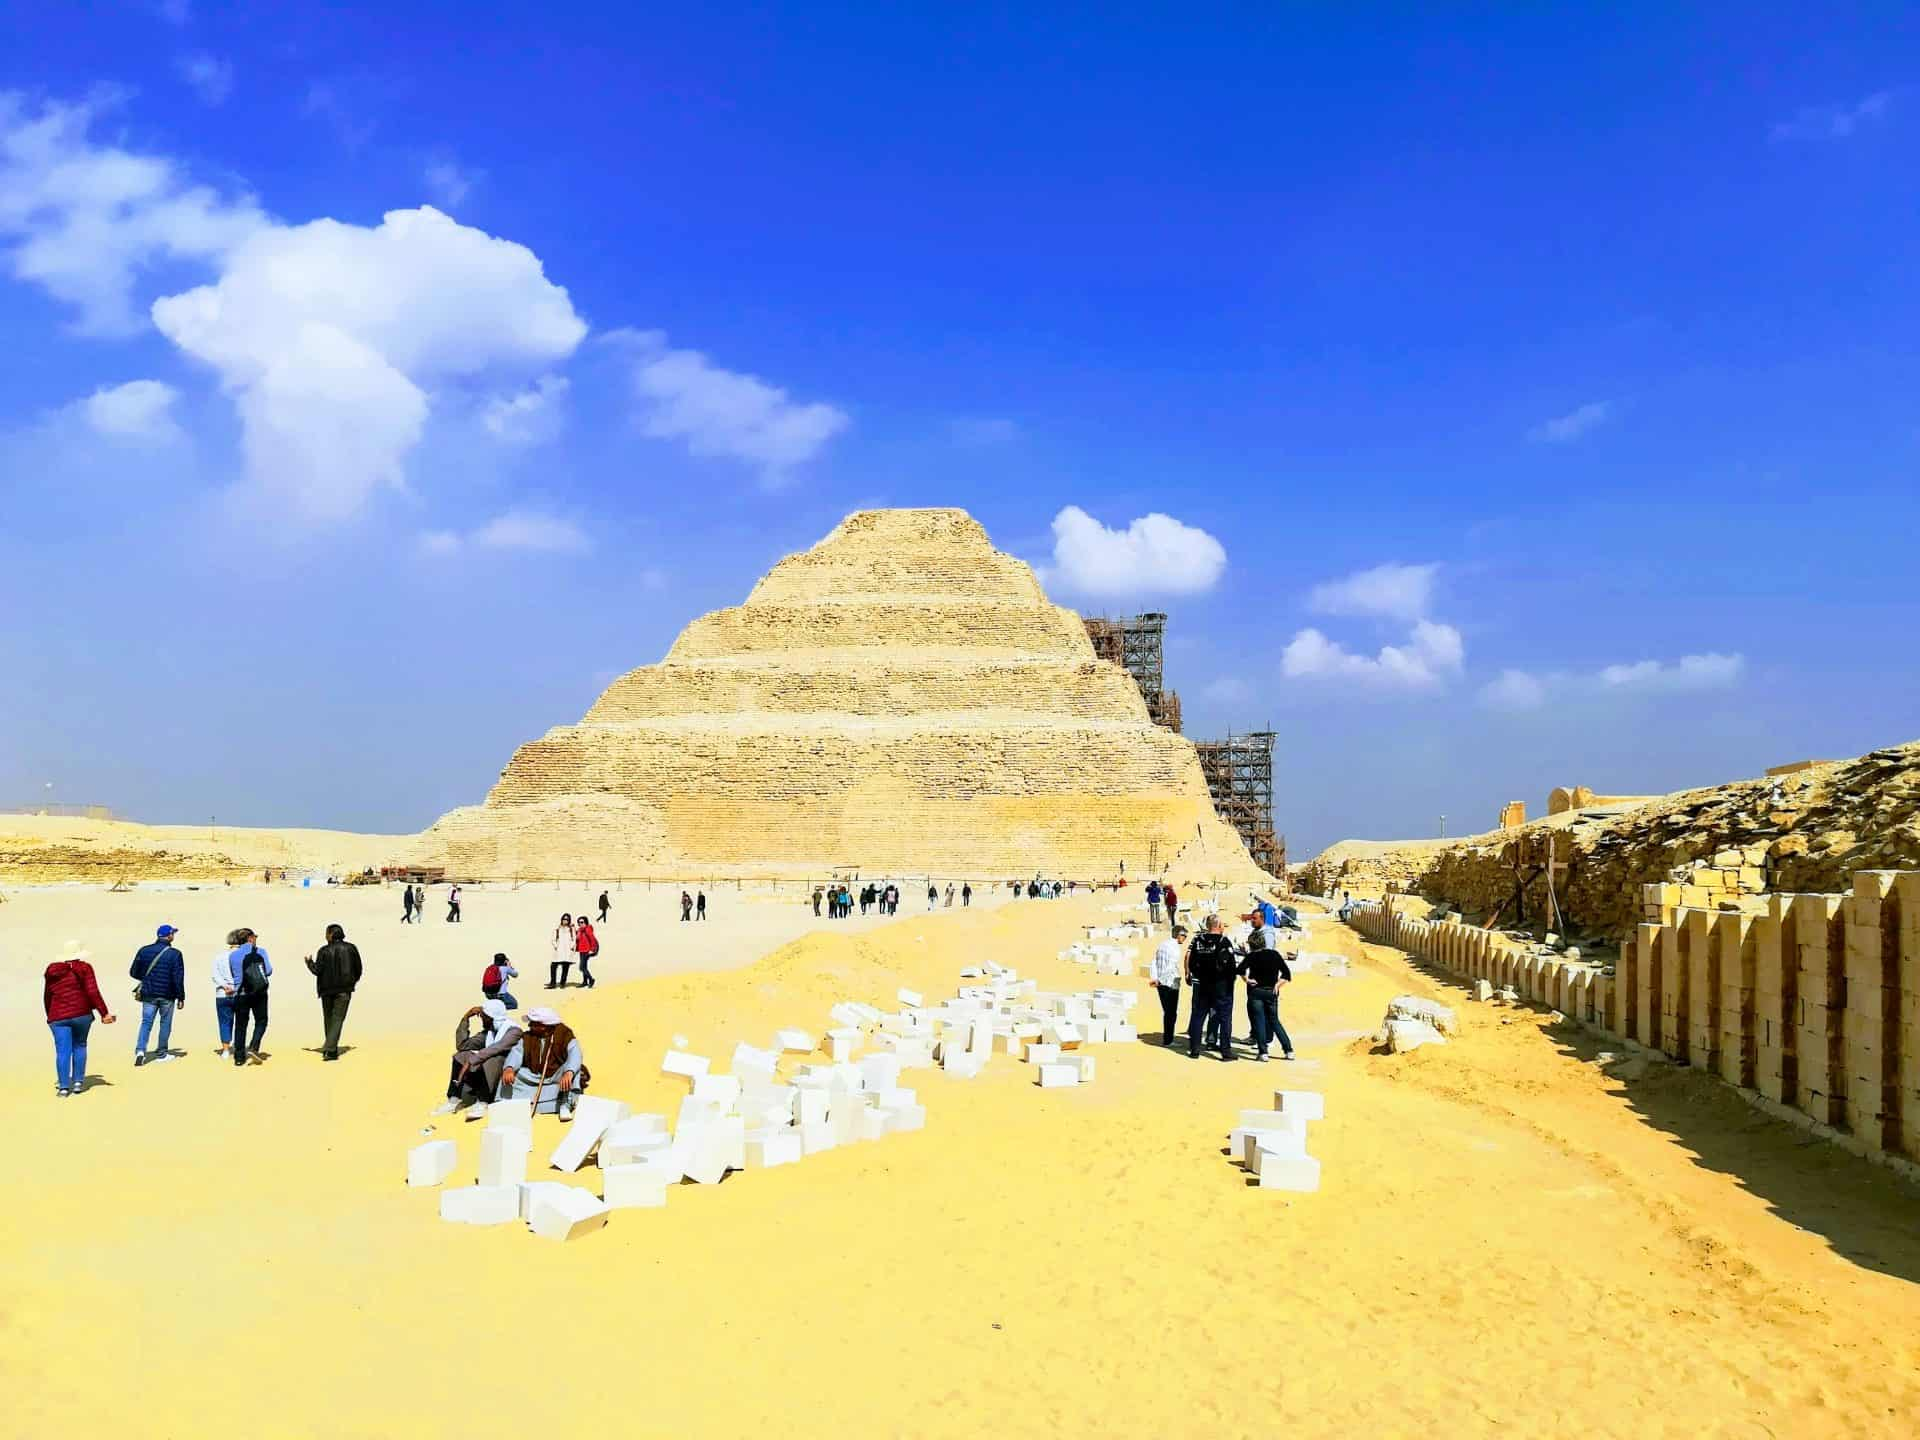 Pyramiden Tour – Pur. Exklusiver Privat Ausflug